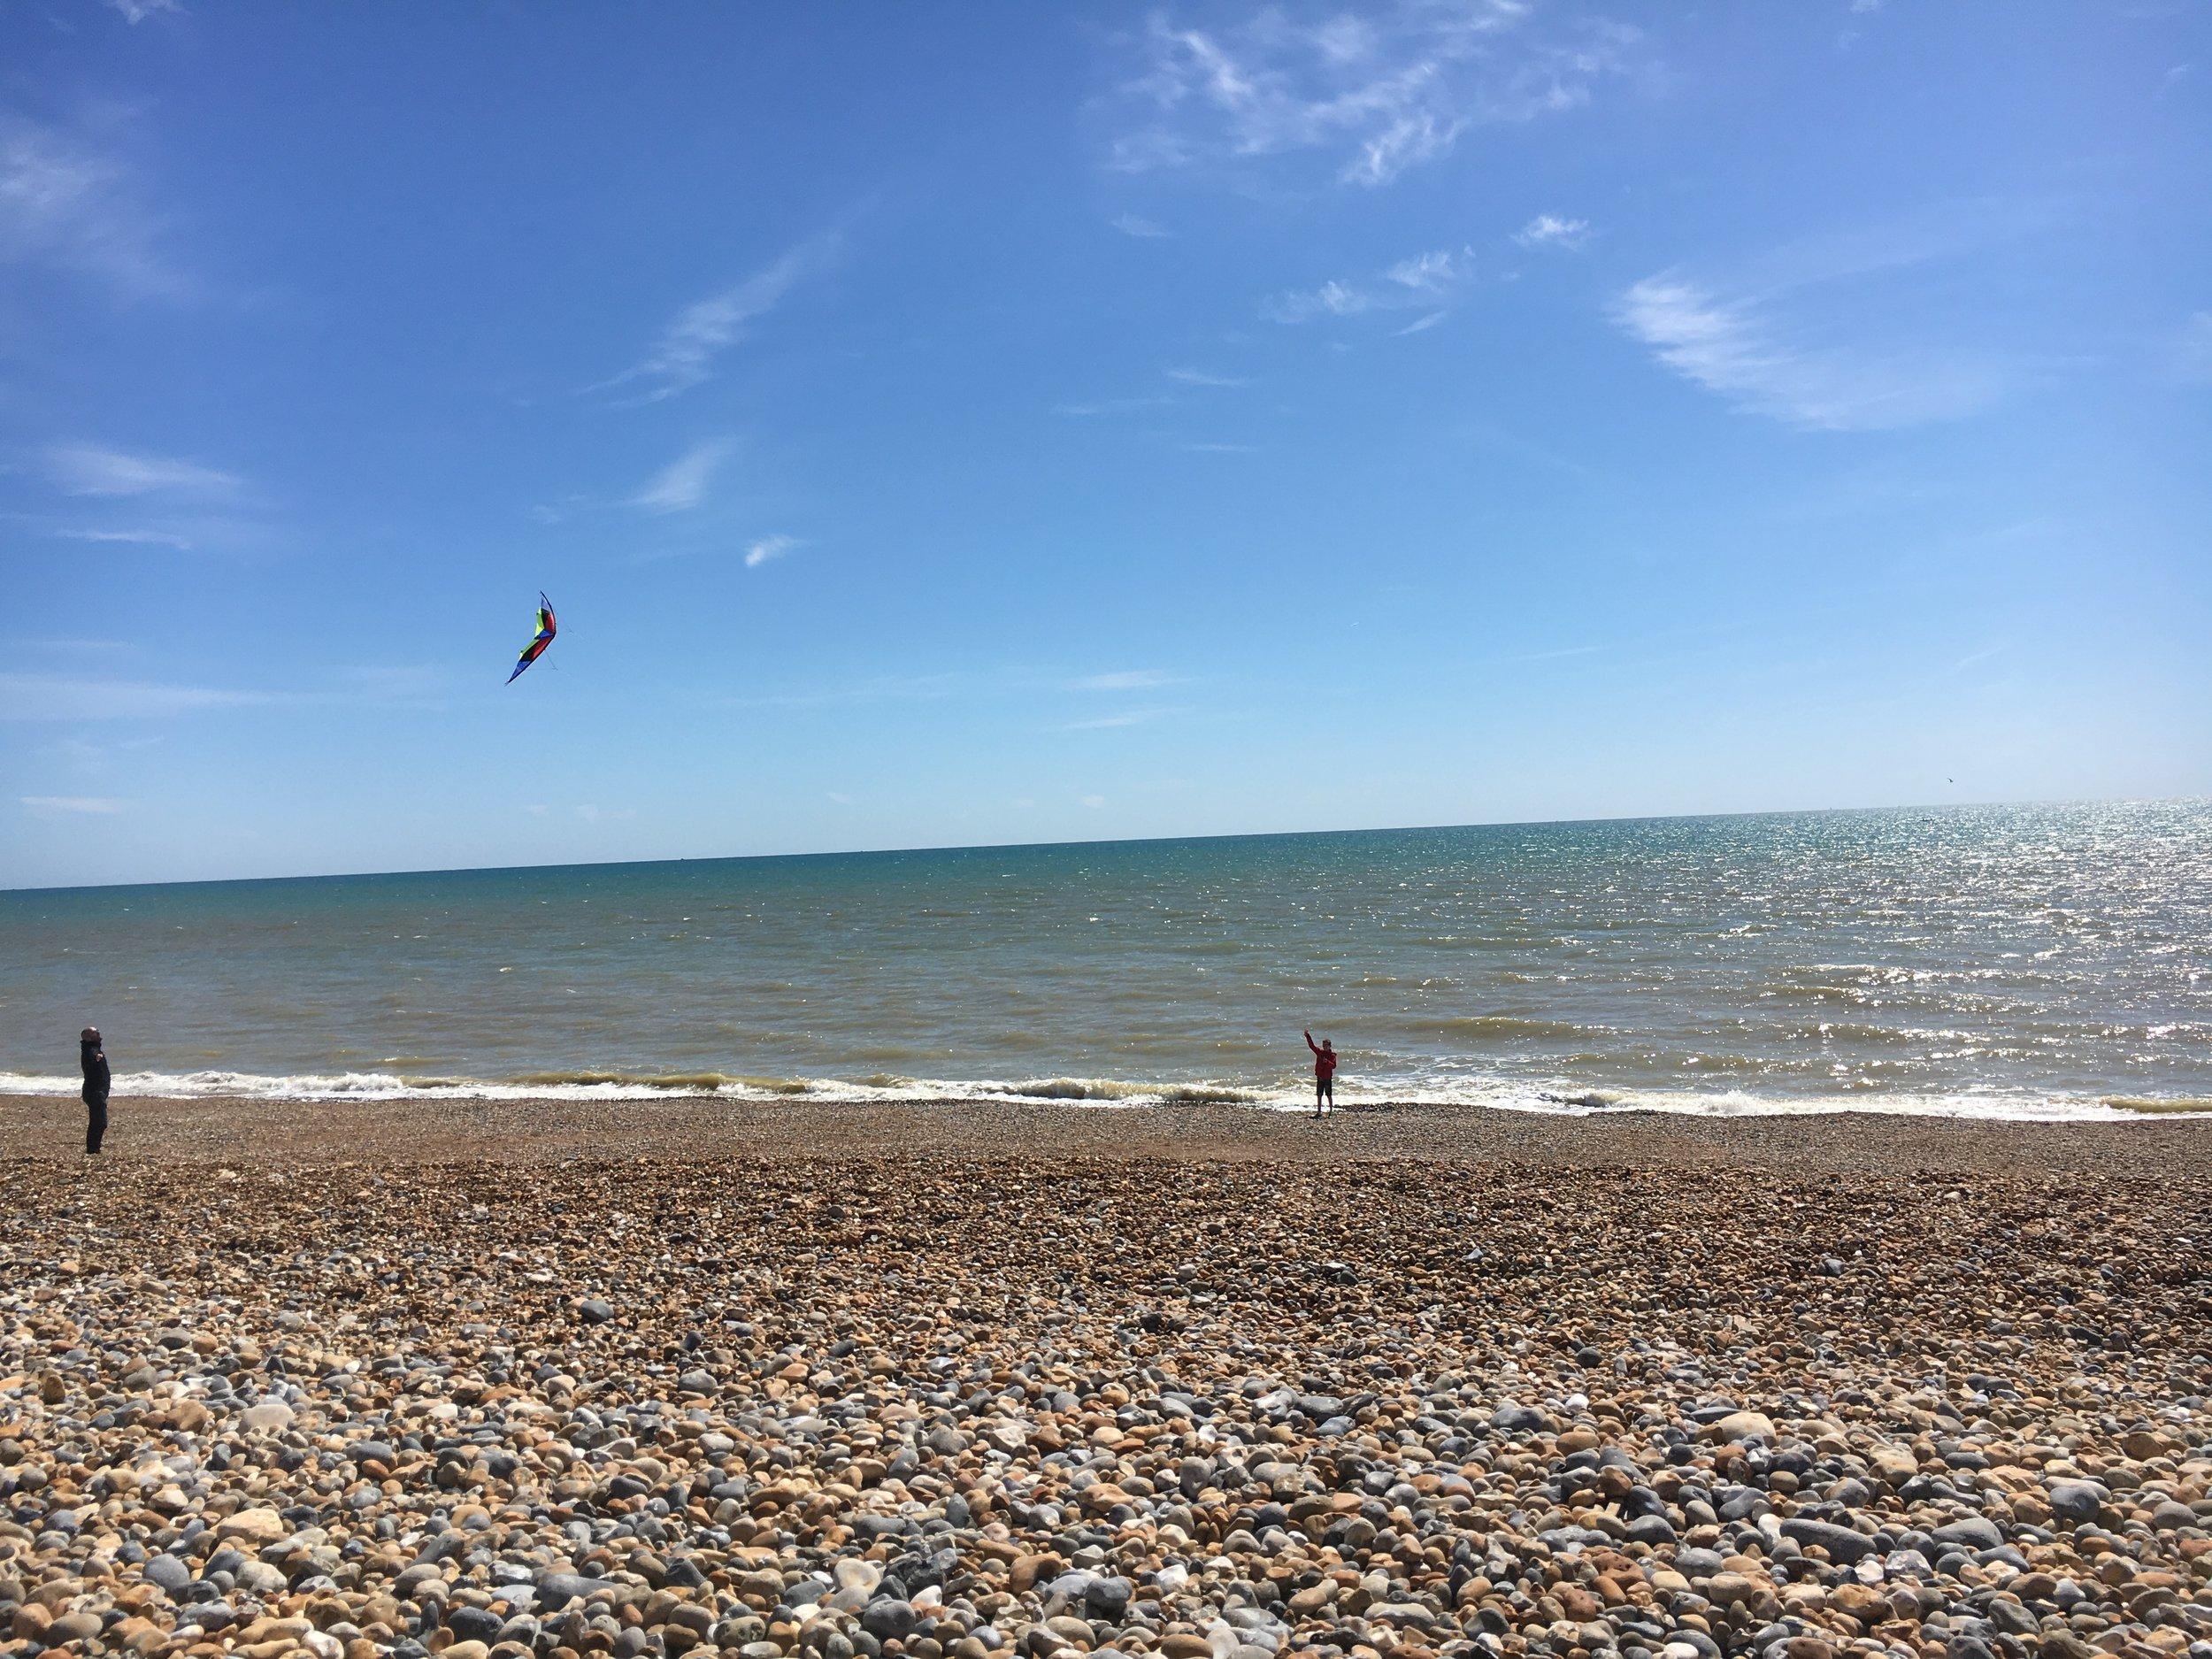 Kite-flying on Hove Beach